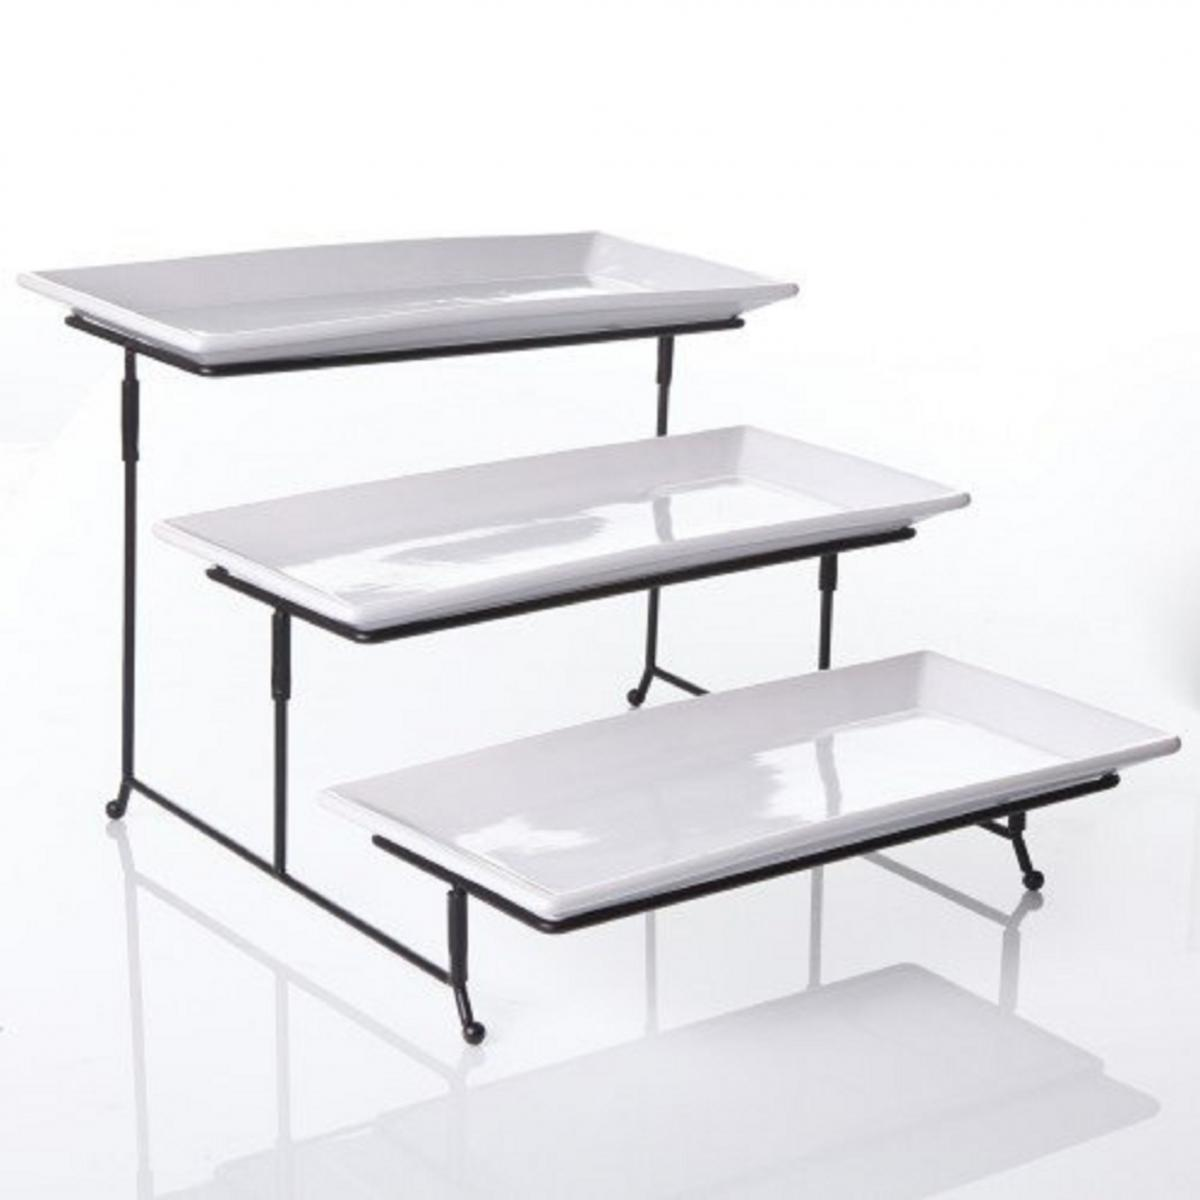 New 3 Tier Rectangular Serving Platter Cake Tray Stand